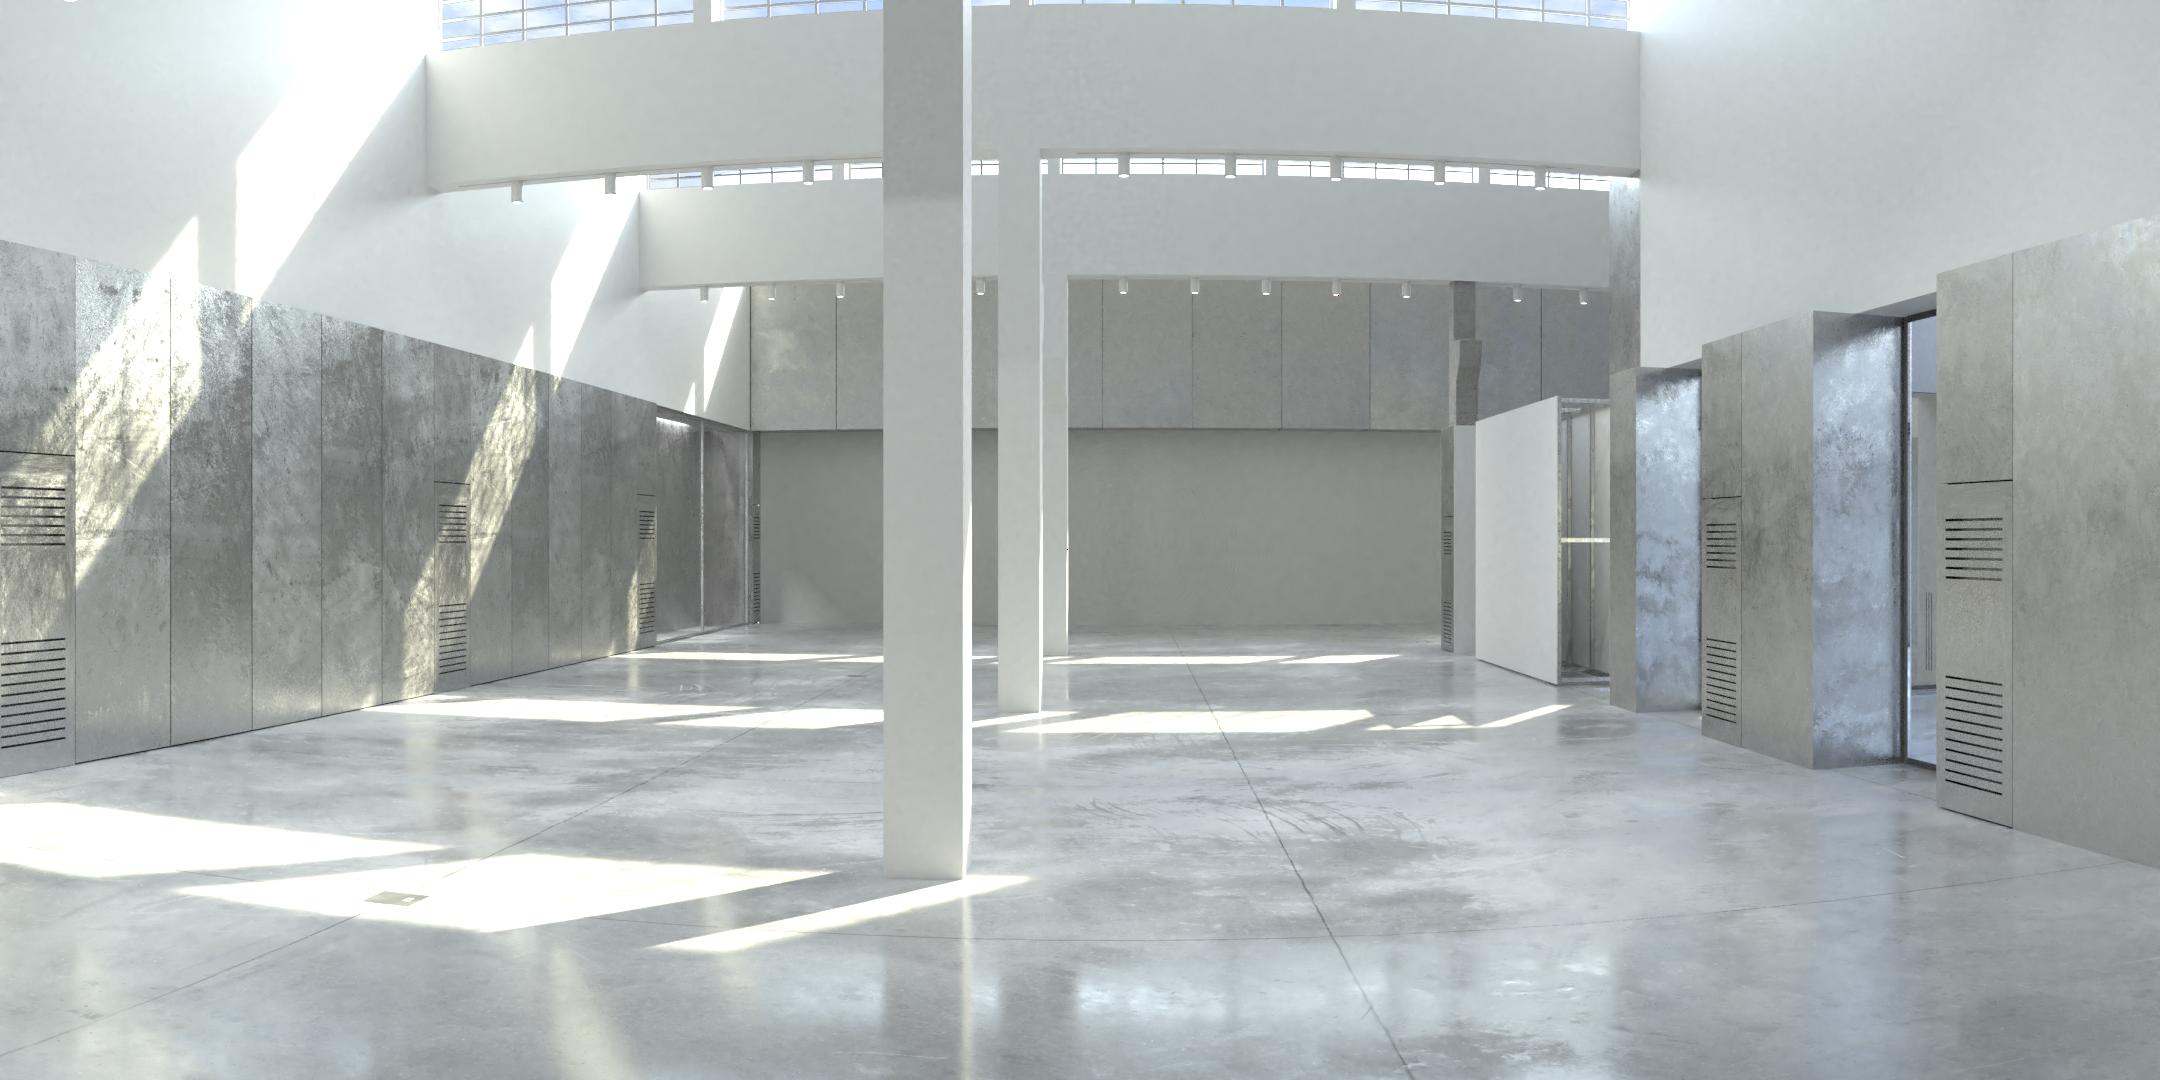 Kaleidoscope Magazine Spazio Maiocchi Milan, Italy  Curatorial Visualization